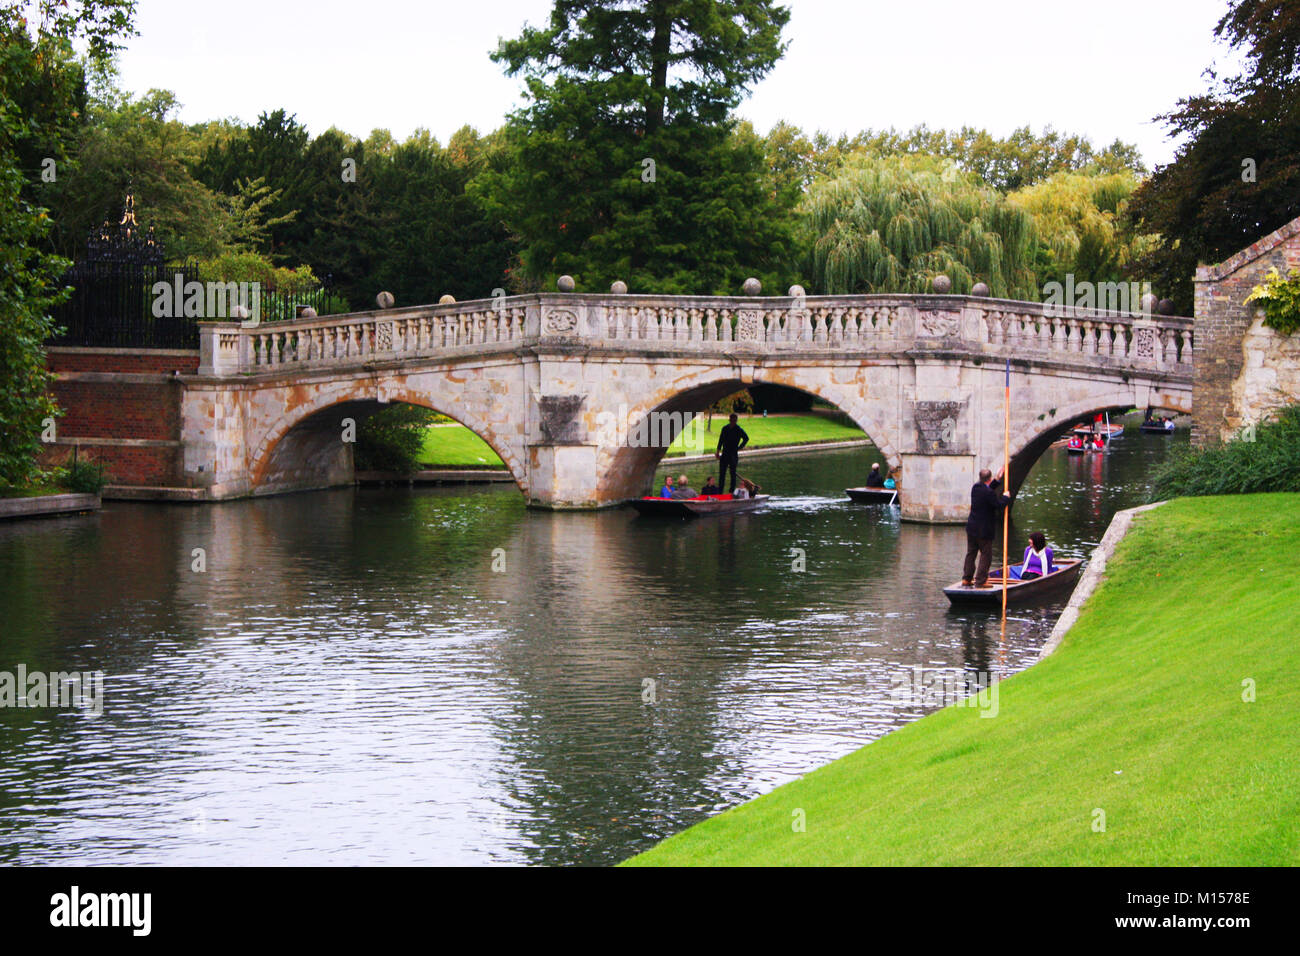 Punting in Cambridge, UK Stock Photo